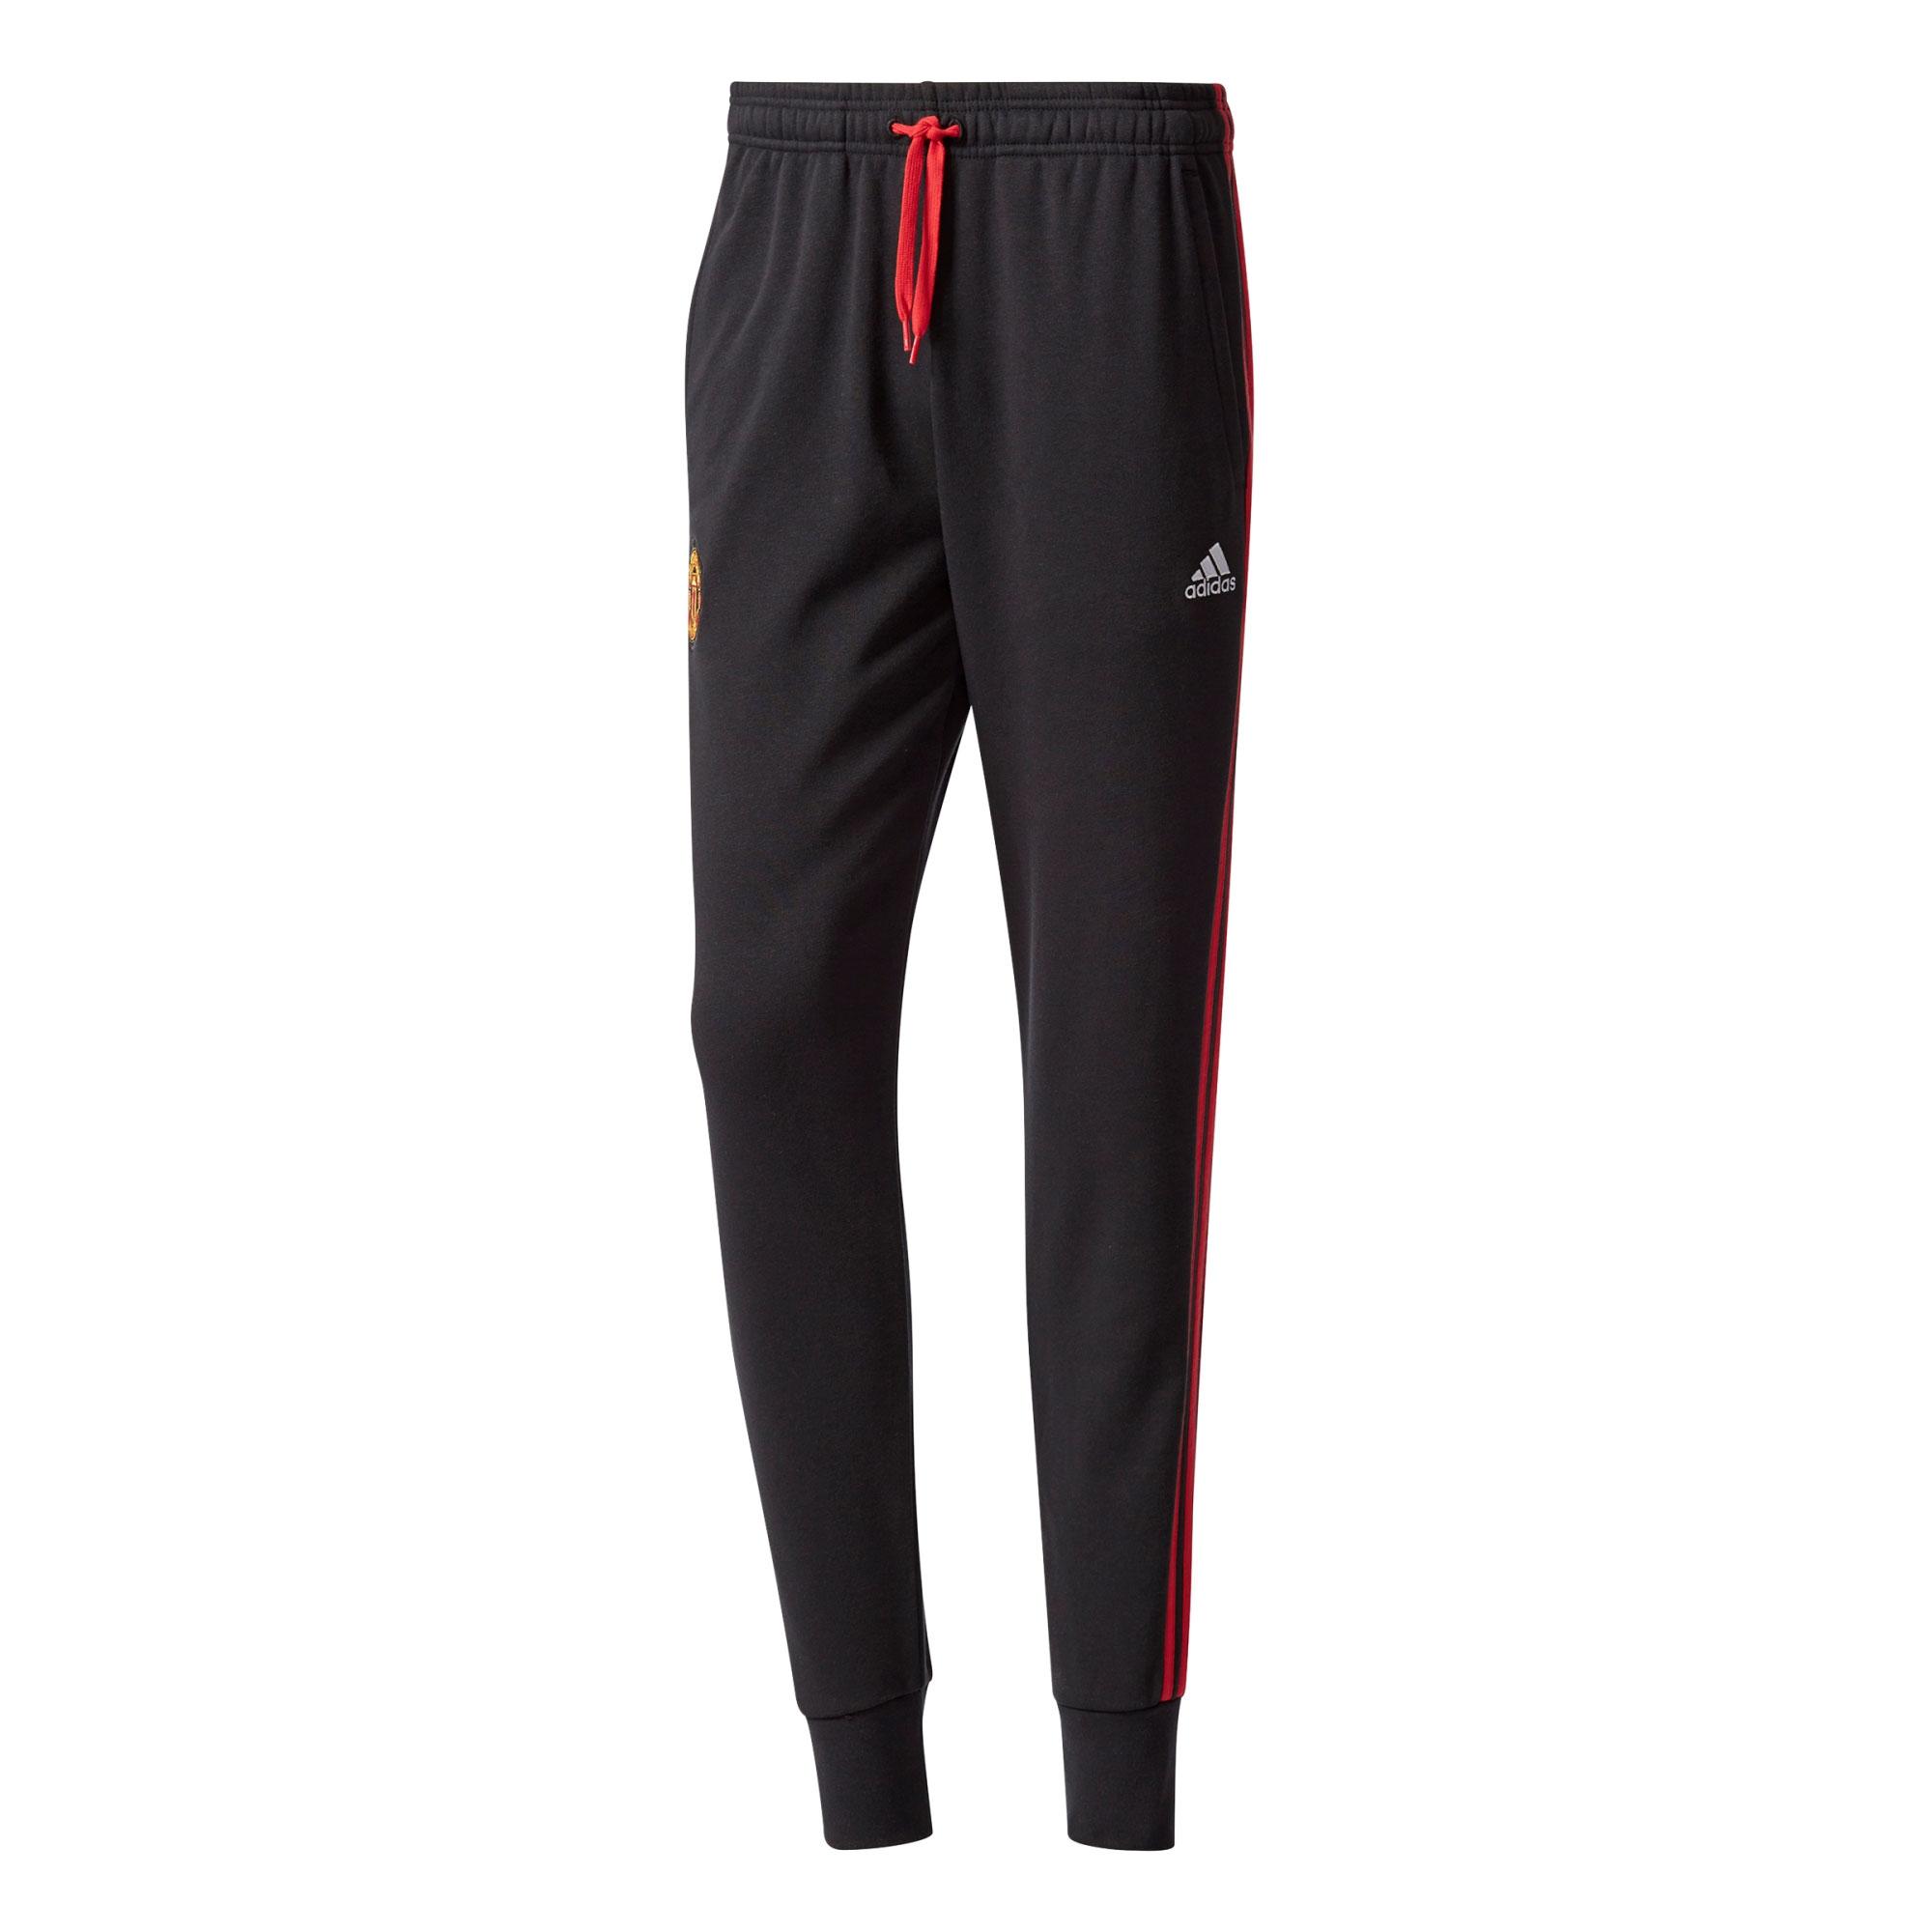 Manchester United 3 Stripe Pant - Black